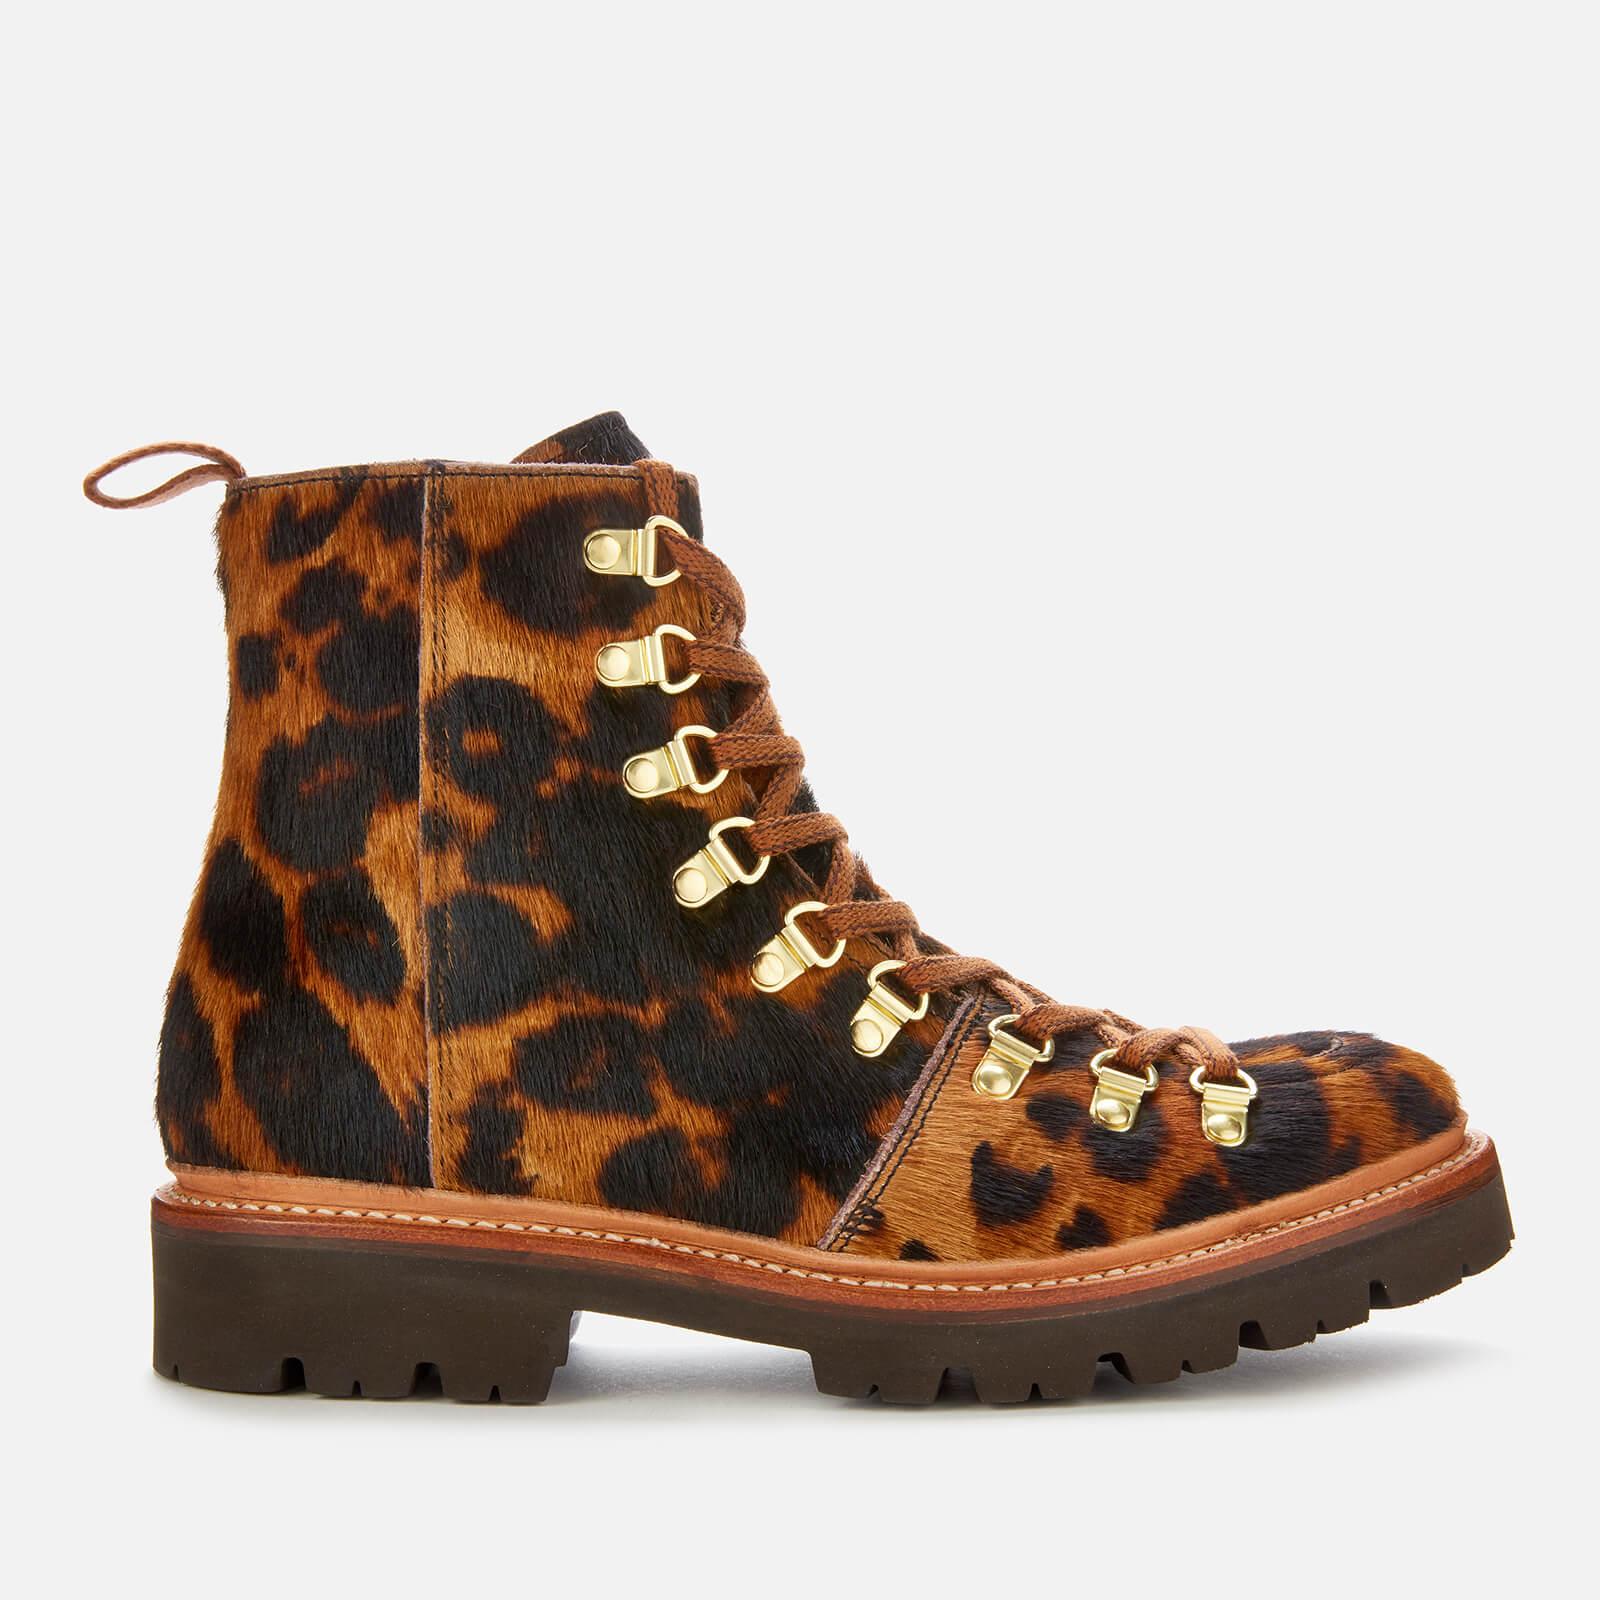 Grenson Women's Nanette Leopard Print Pony Hiking Style Boots - Brown - Uk 3